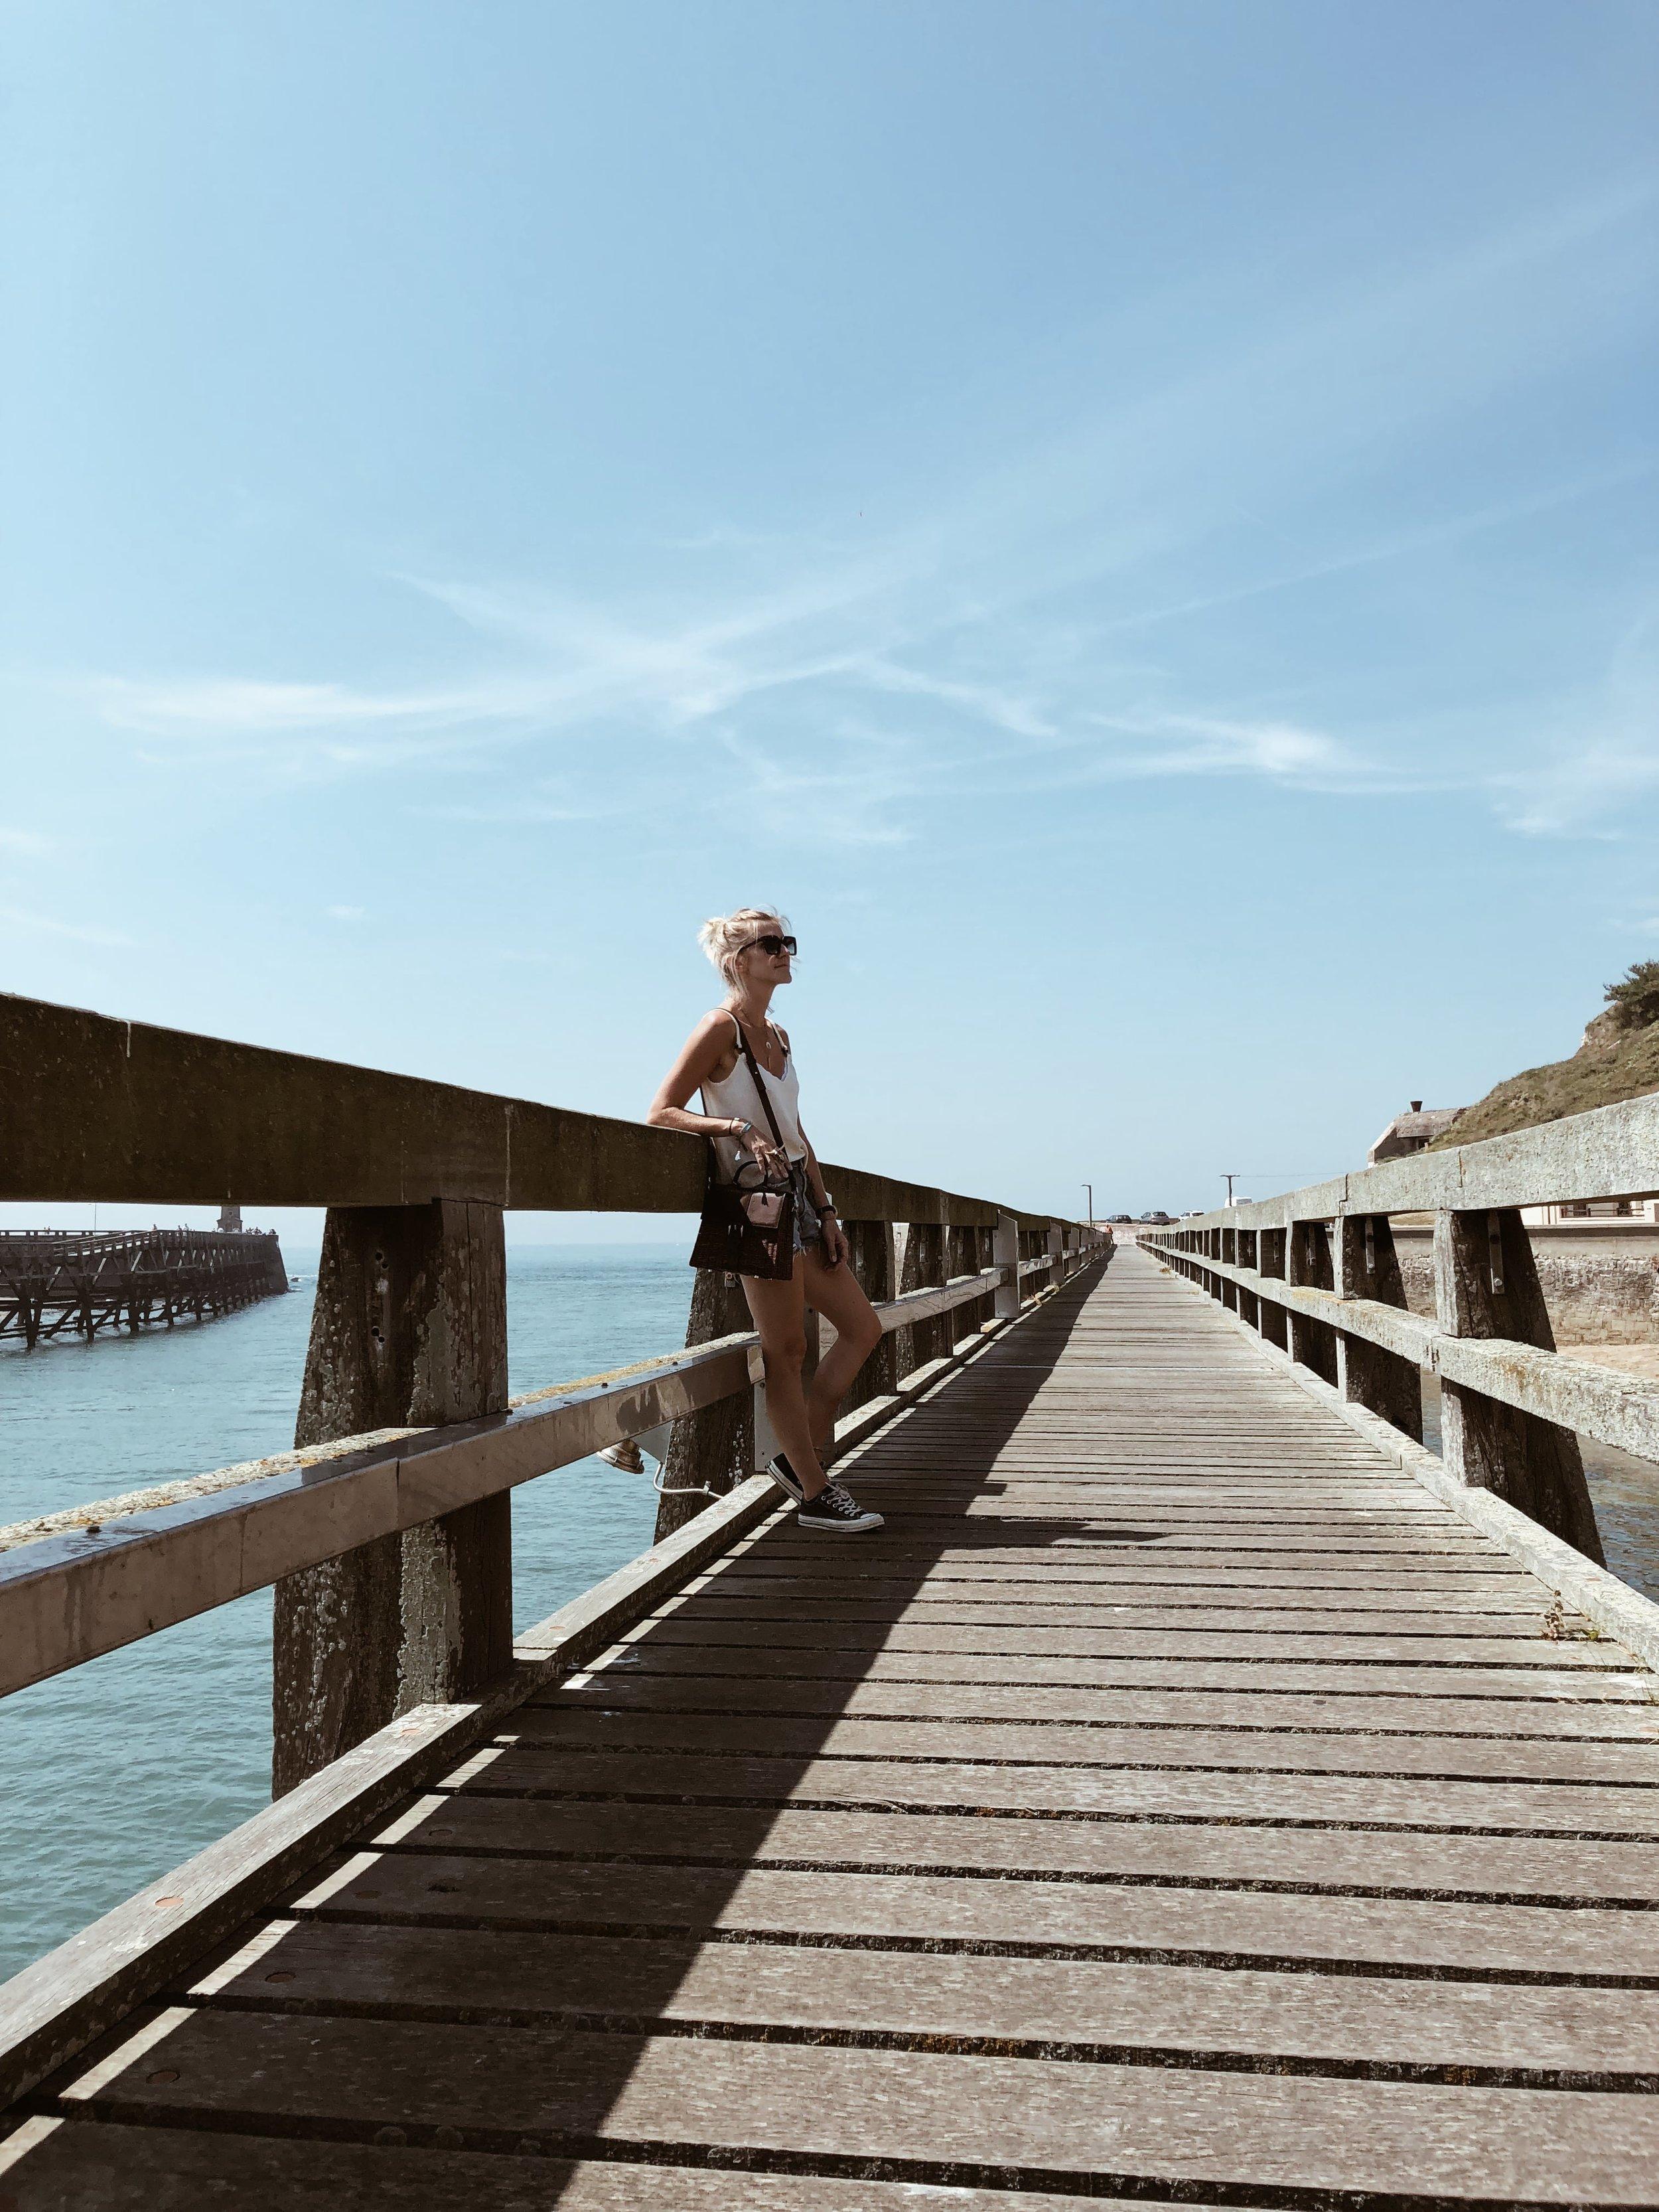 Carnet sauvage- blog voyage - weekend Etretat11-min.JPG